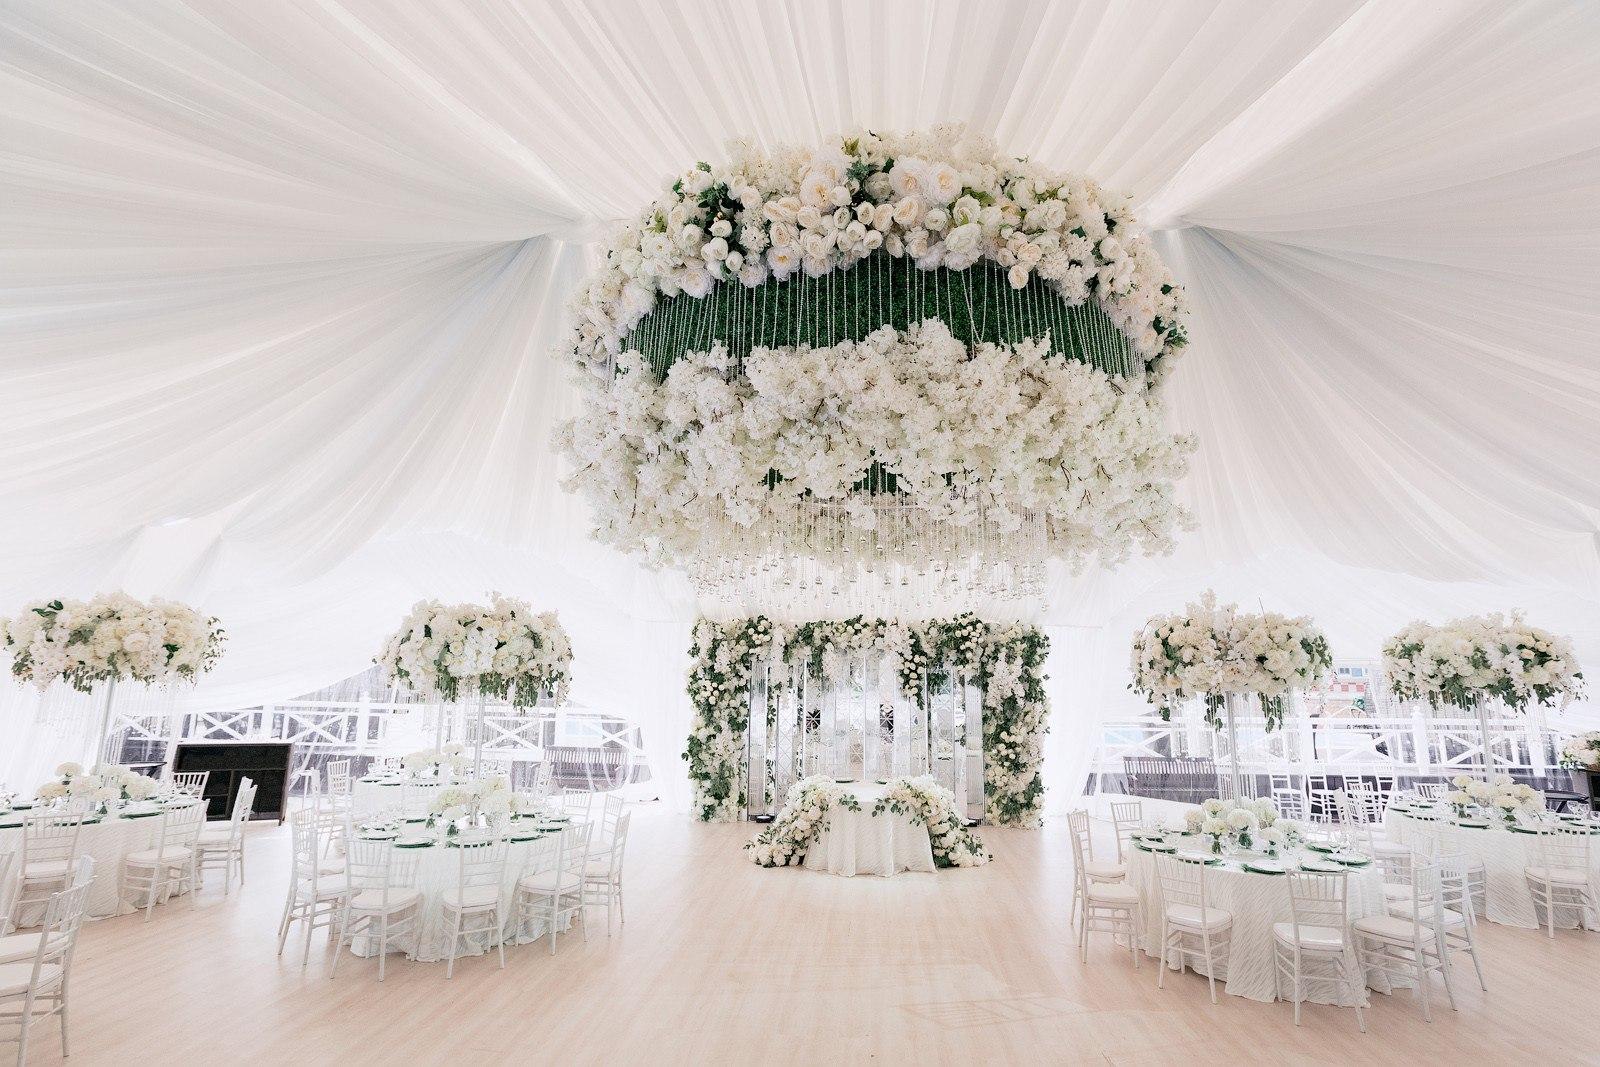 lZh3A3F5Dn8 - Правила декорирования столов на свадьбе